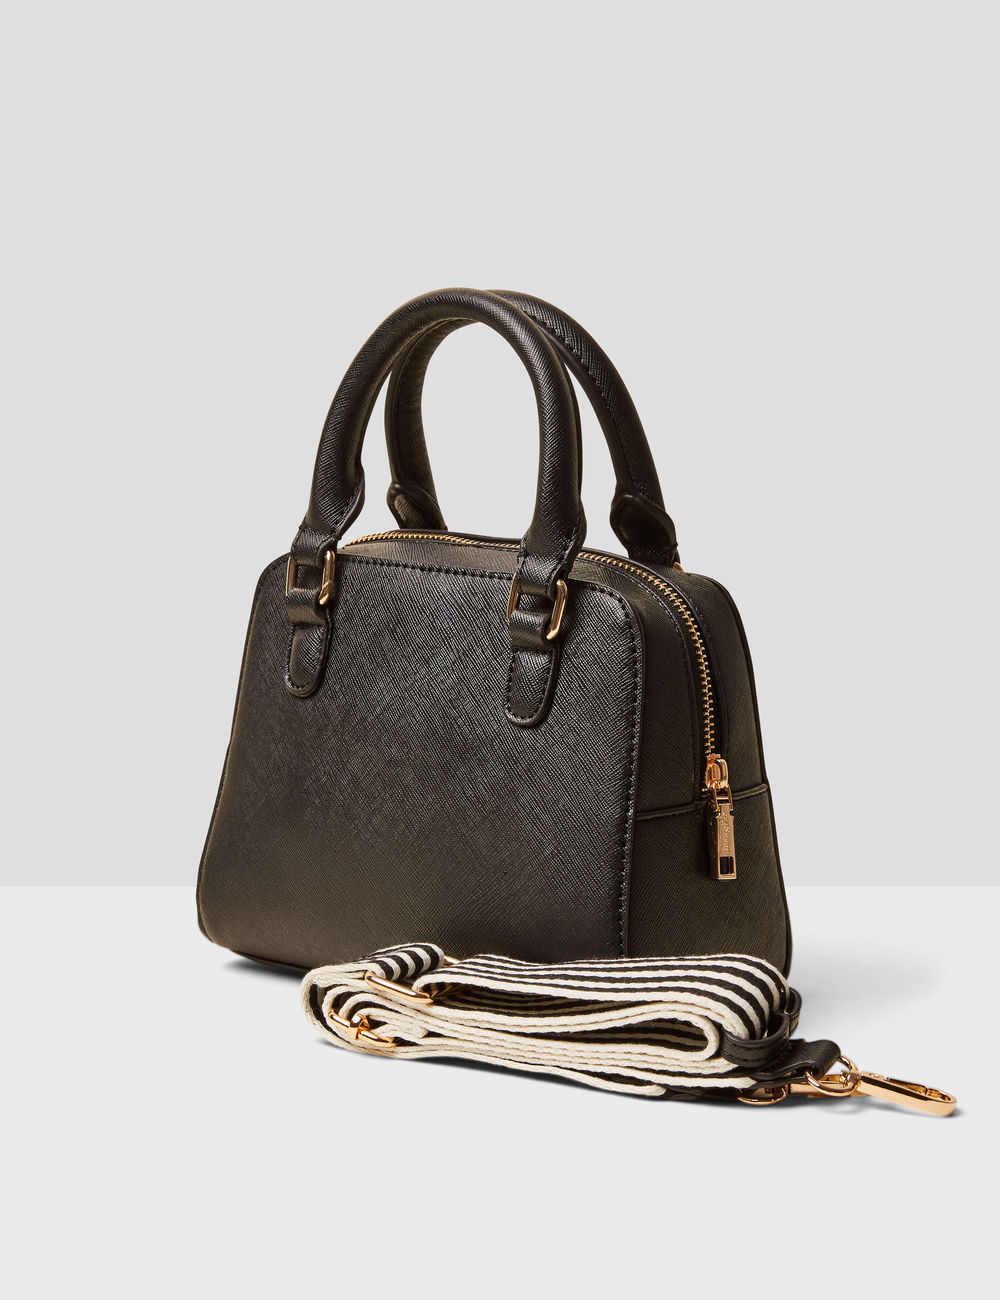 sac à main noir Jennyfer prix 16,99 €